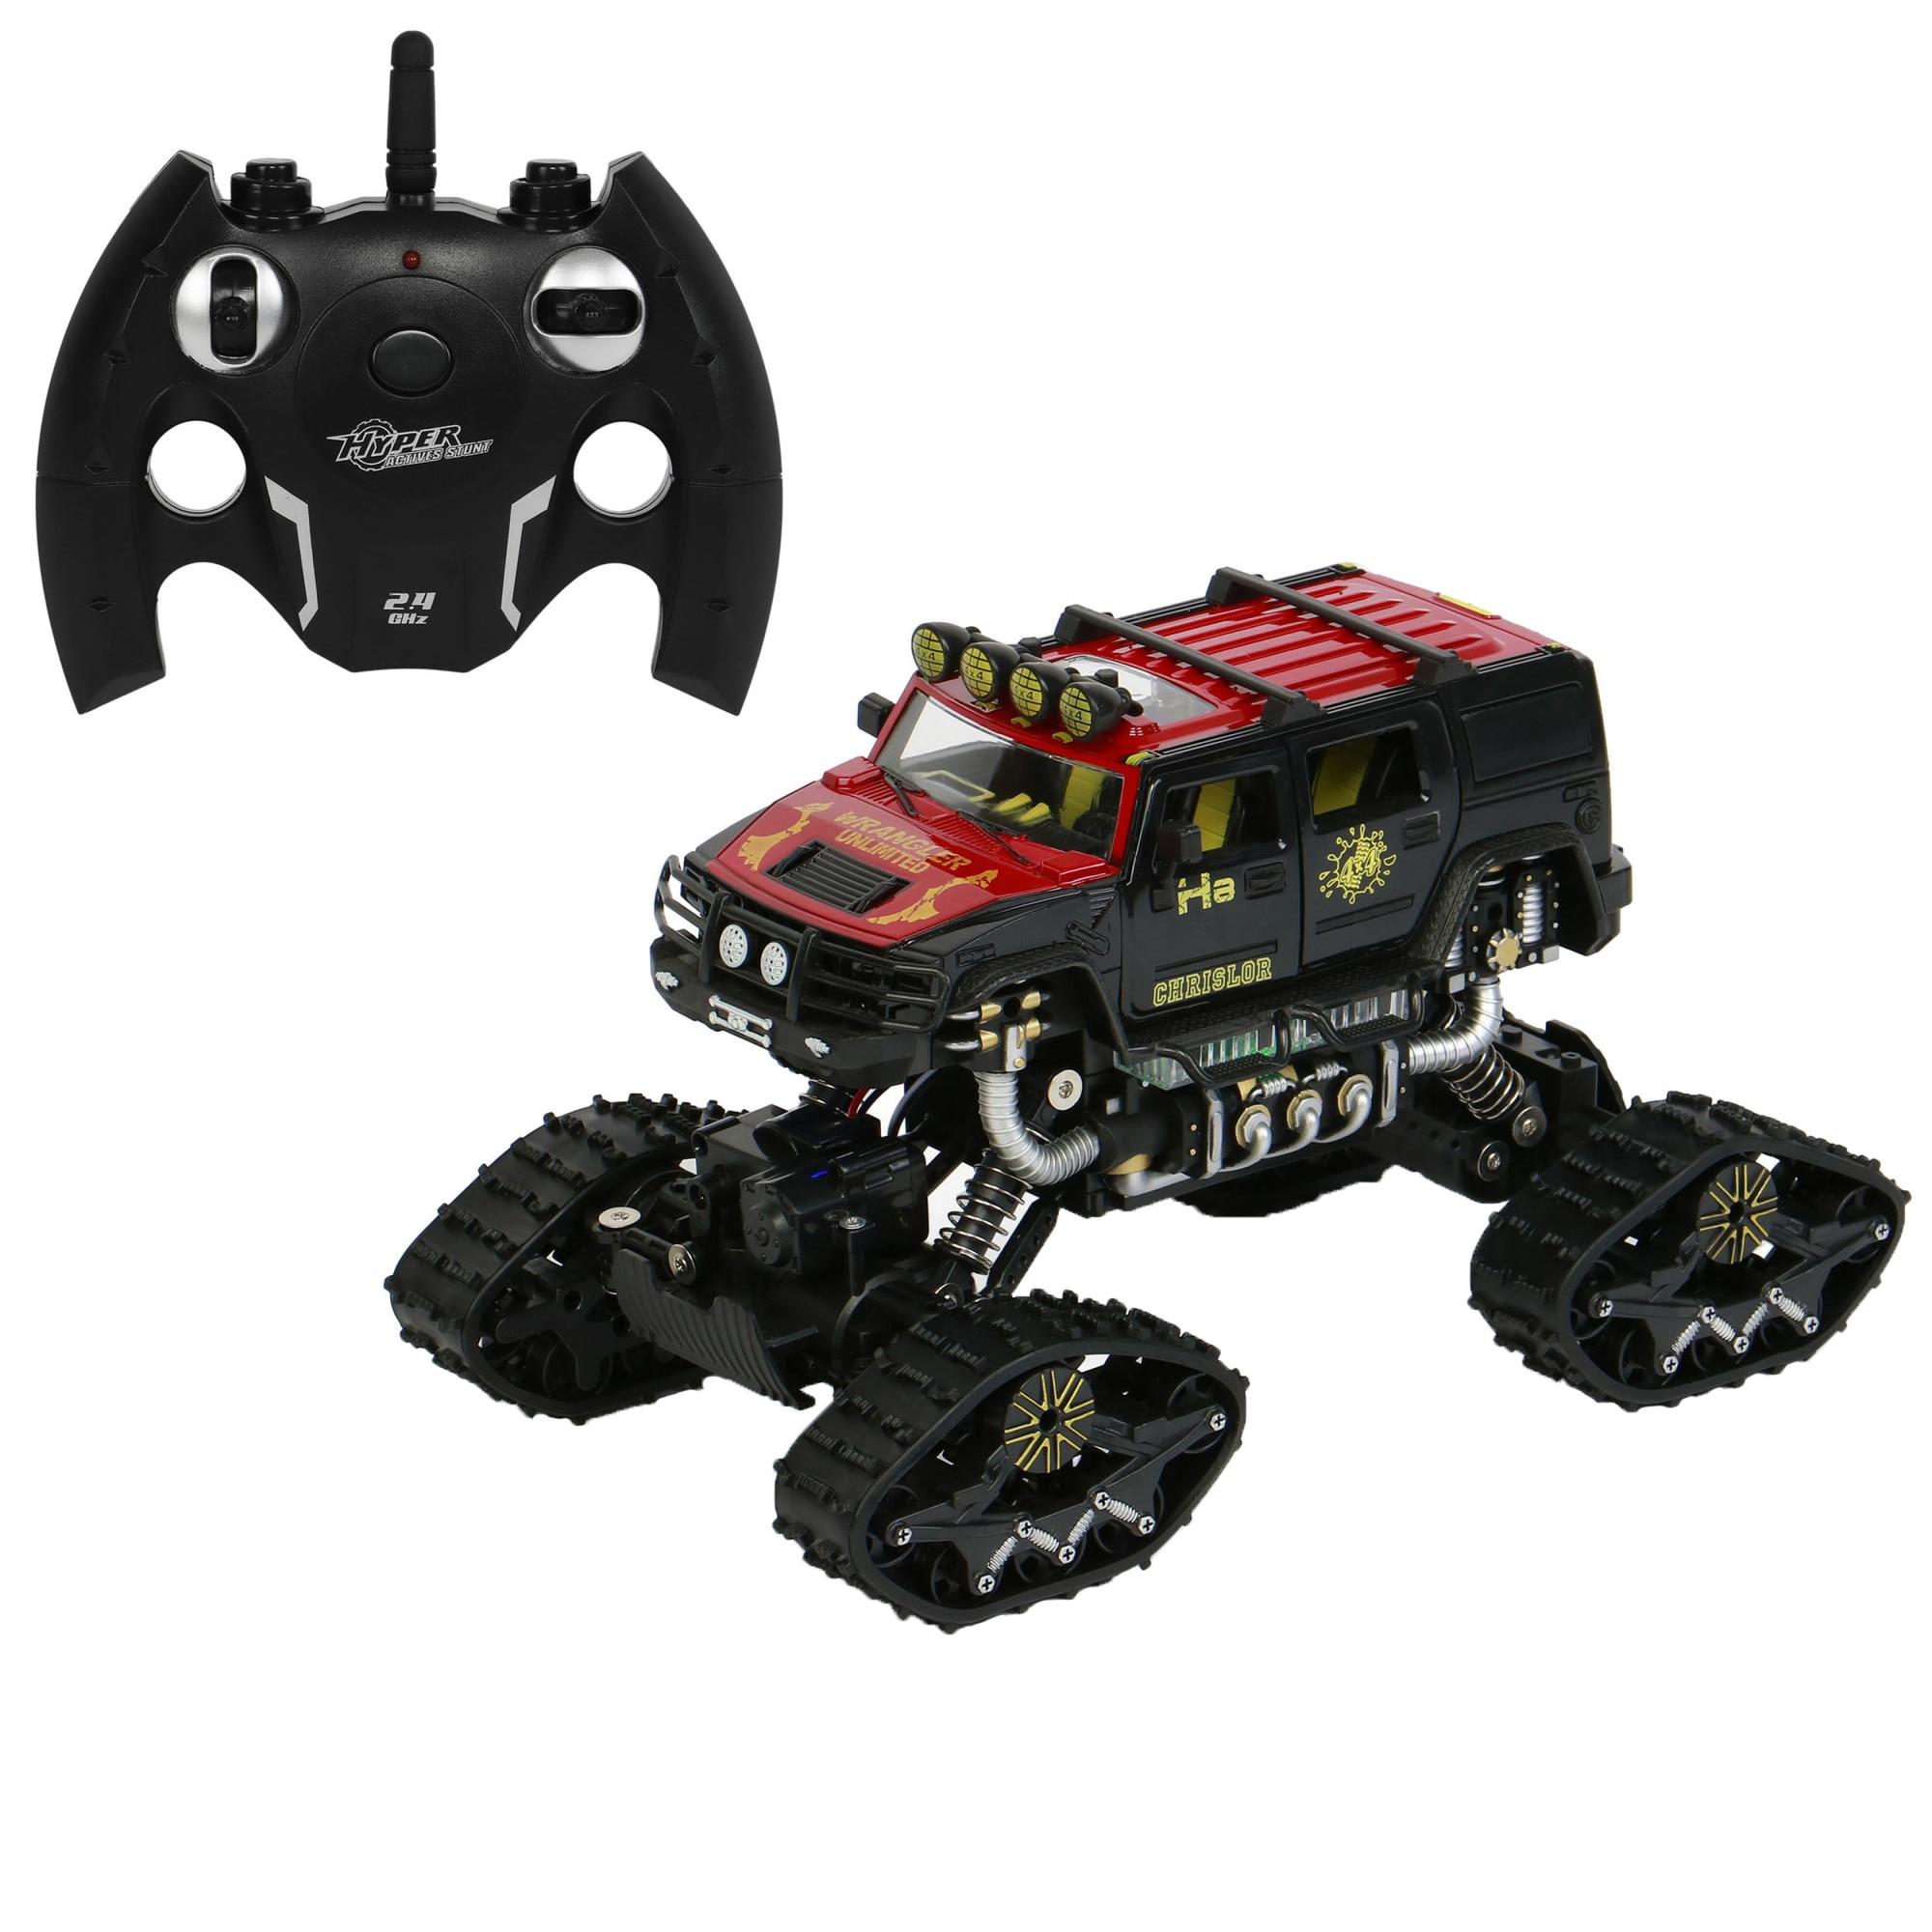 Fotografie Masinuta M-Toys cu telecomanda, Double all terrain, Scala 1:14, Rosu